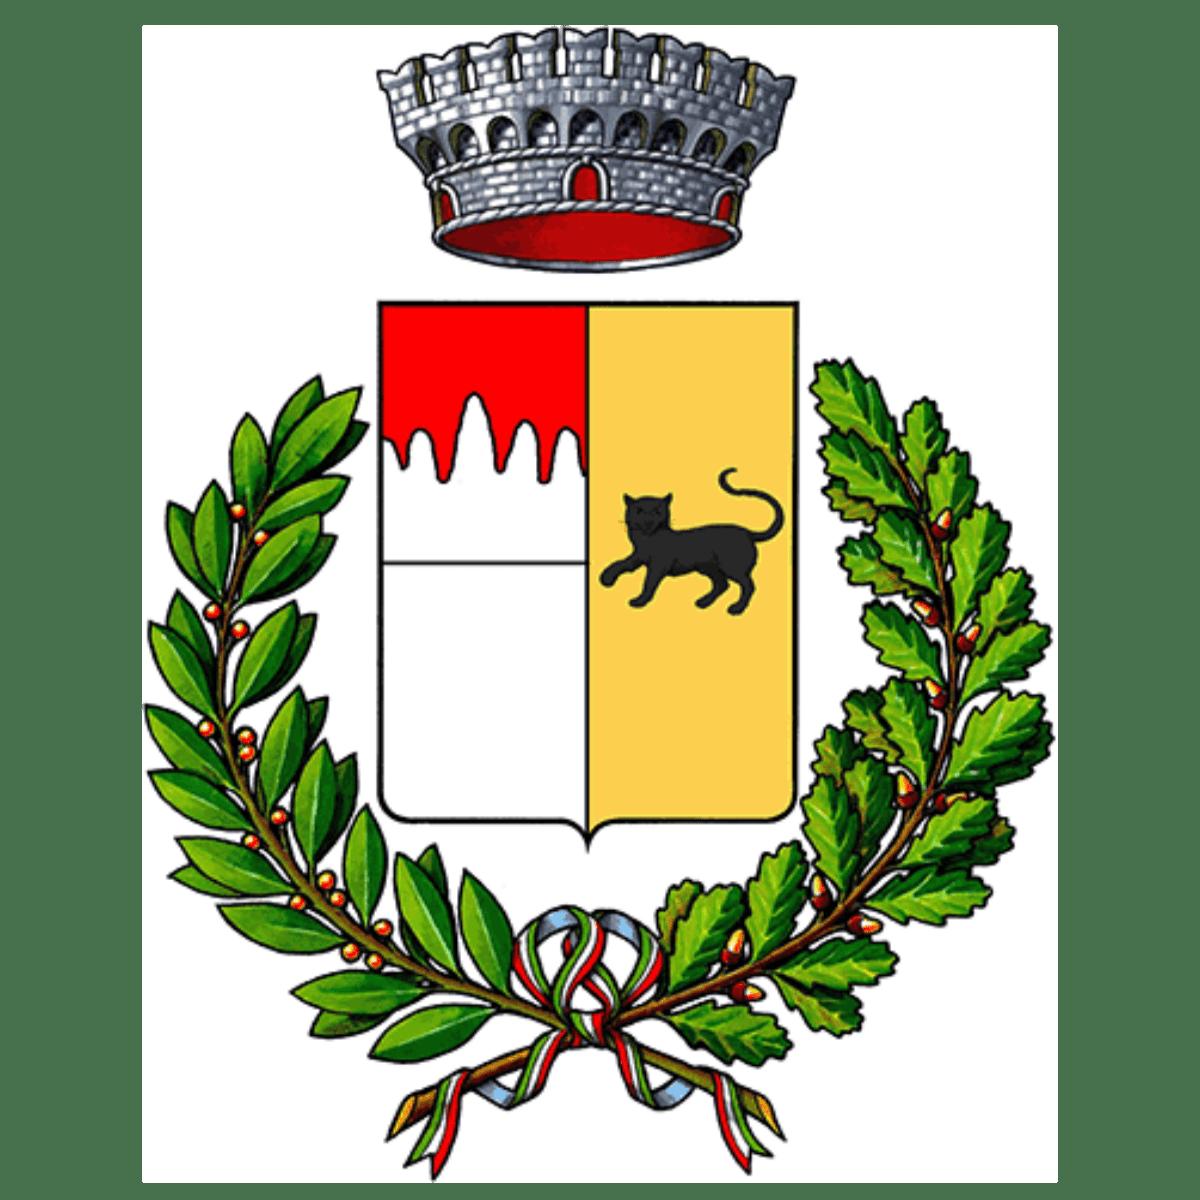 Comune di Siculiana Ciclabili Siciliane